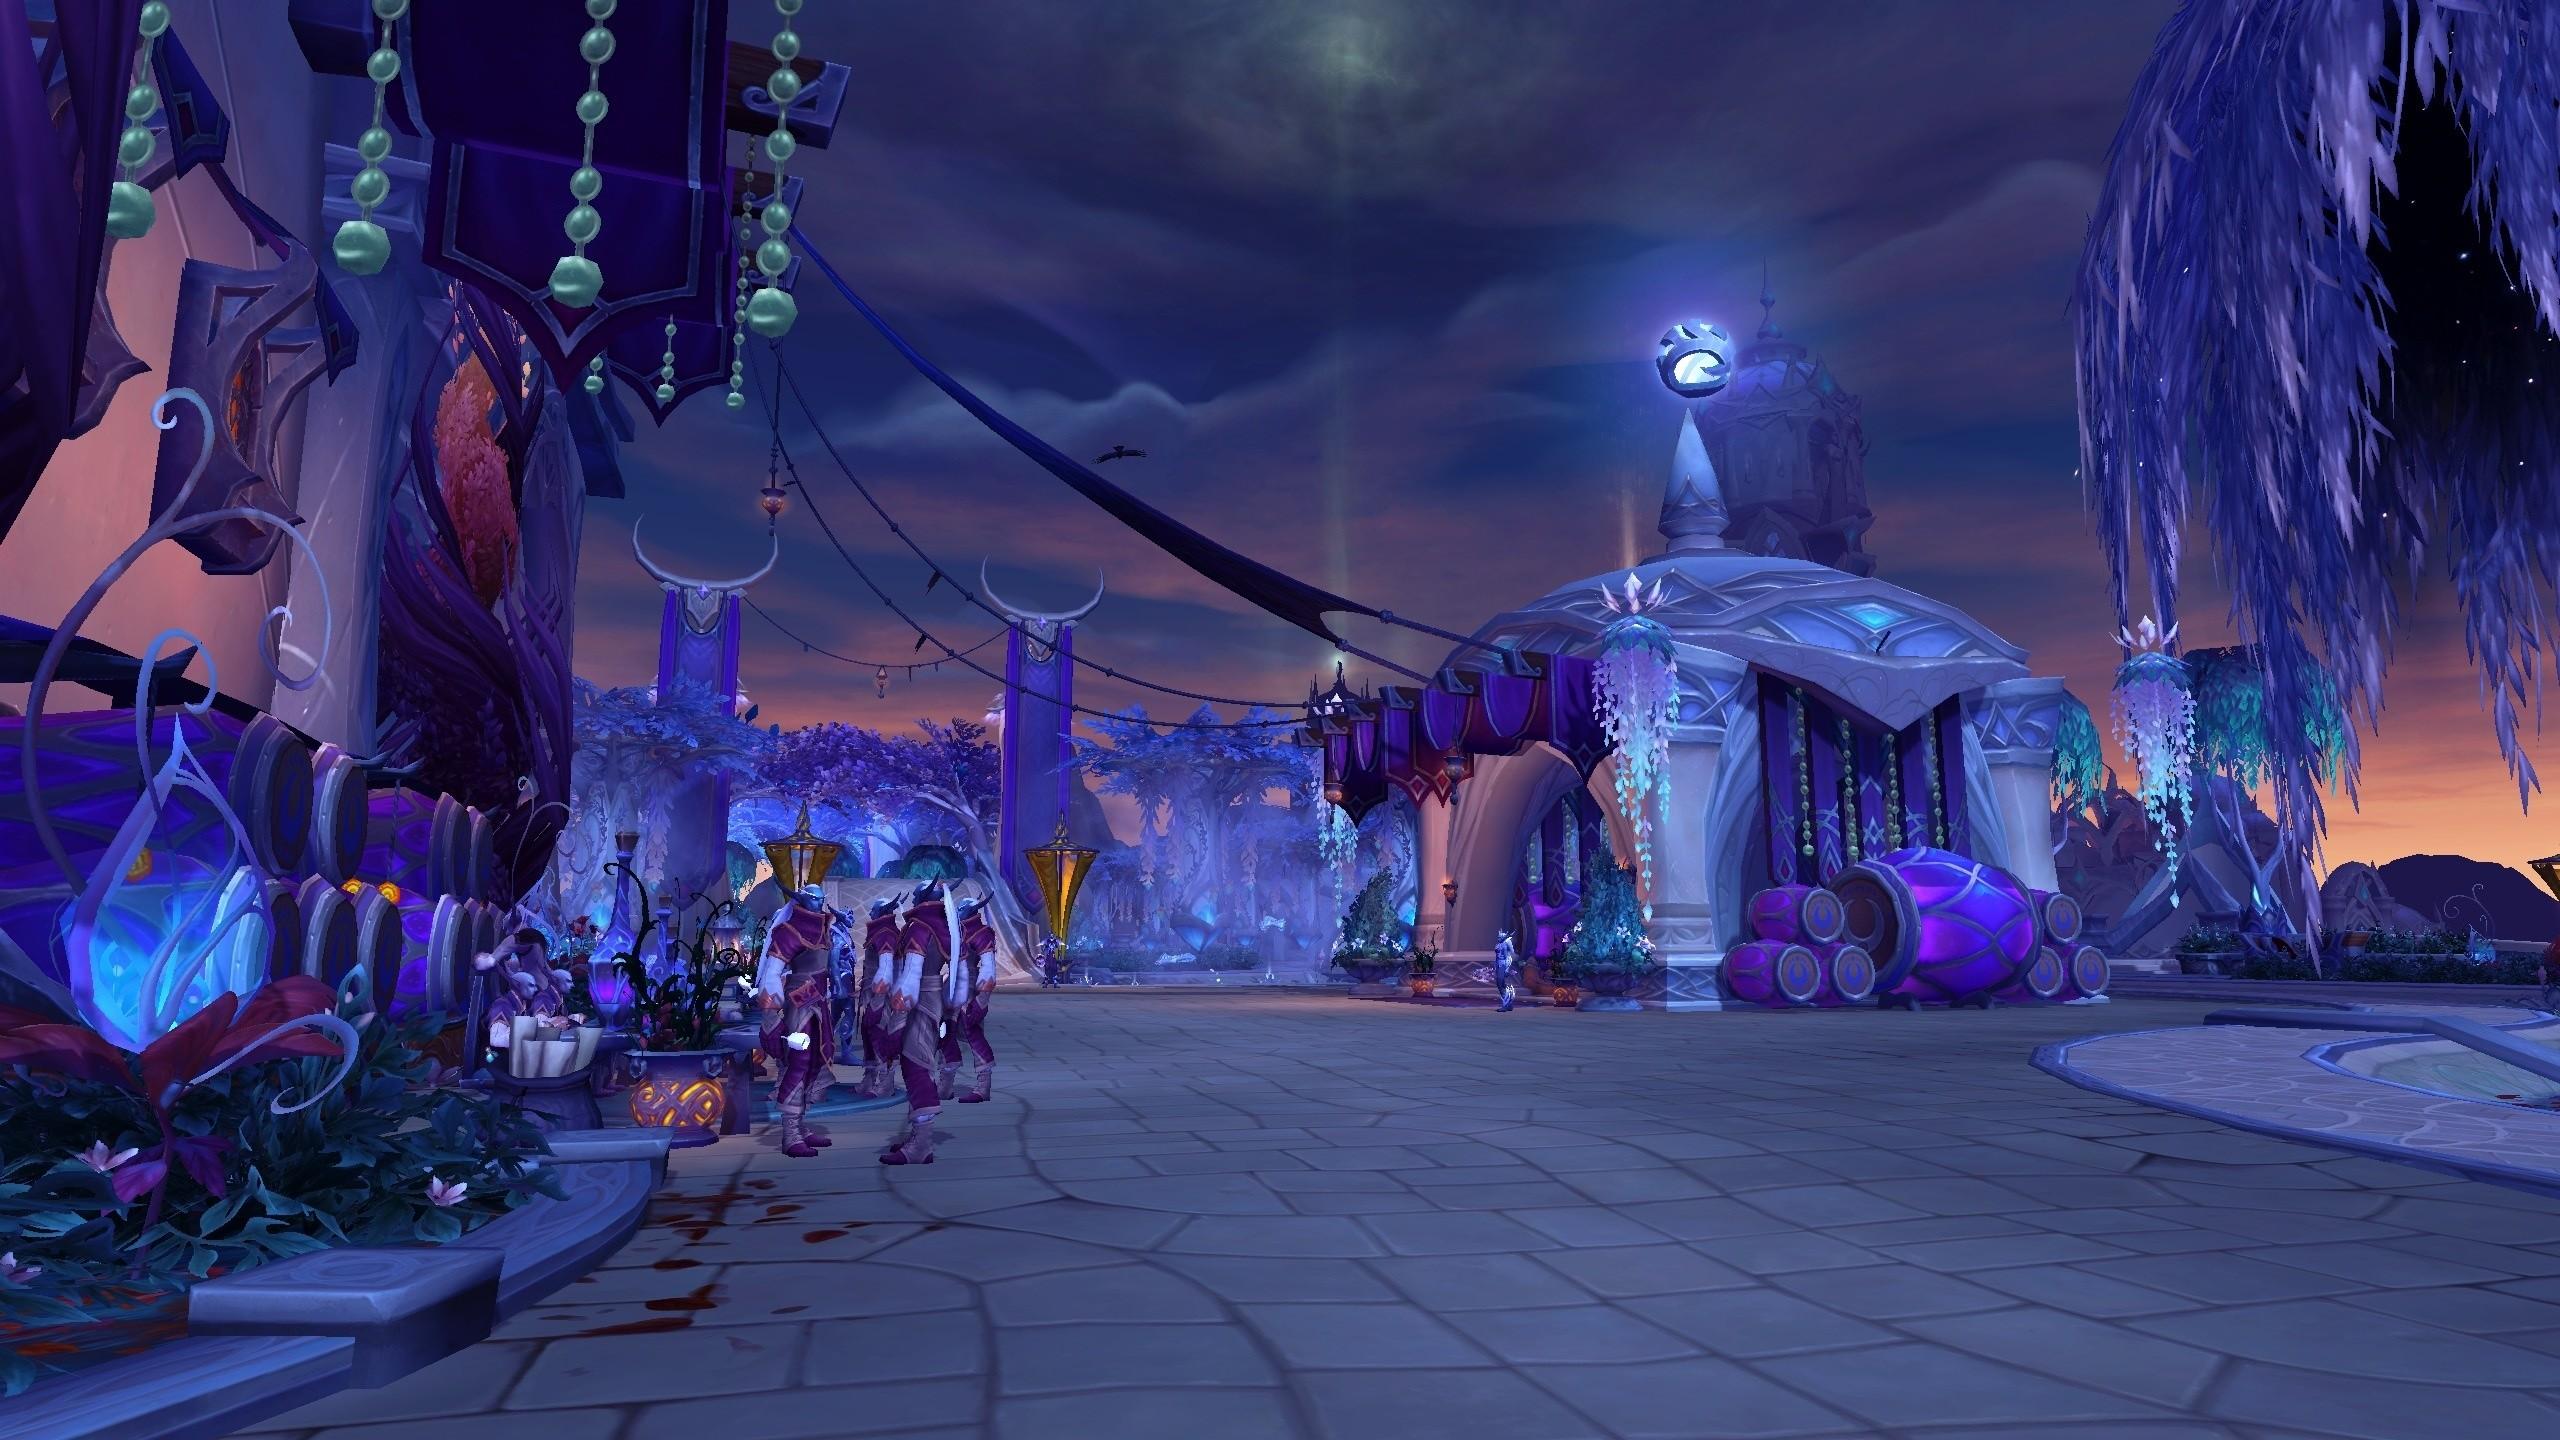 Blizzard and Nostalrius